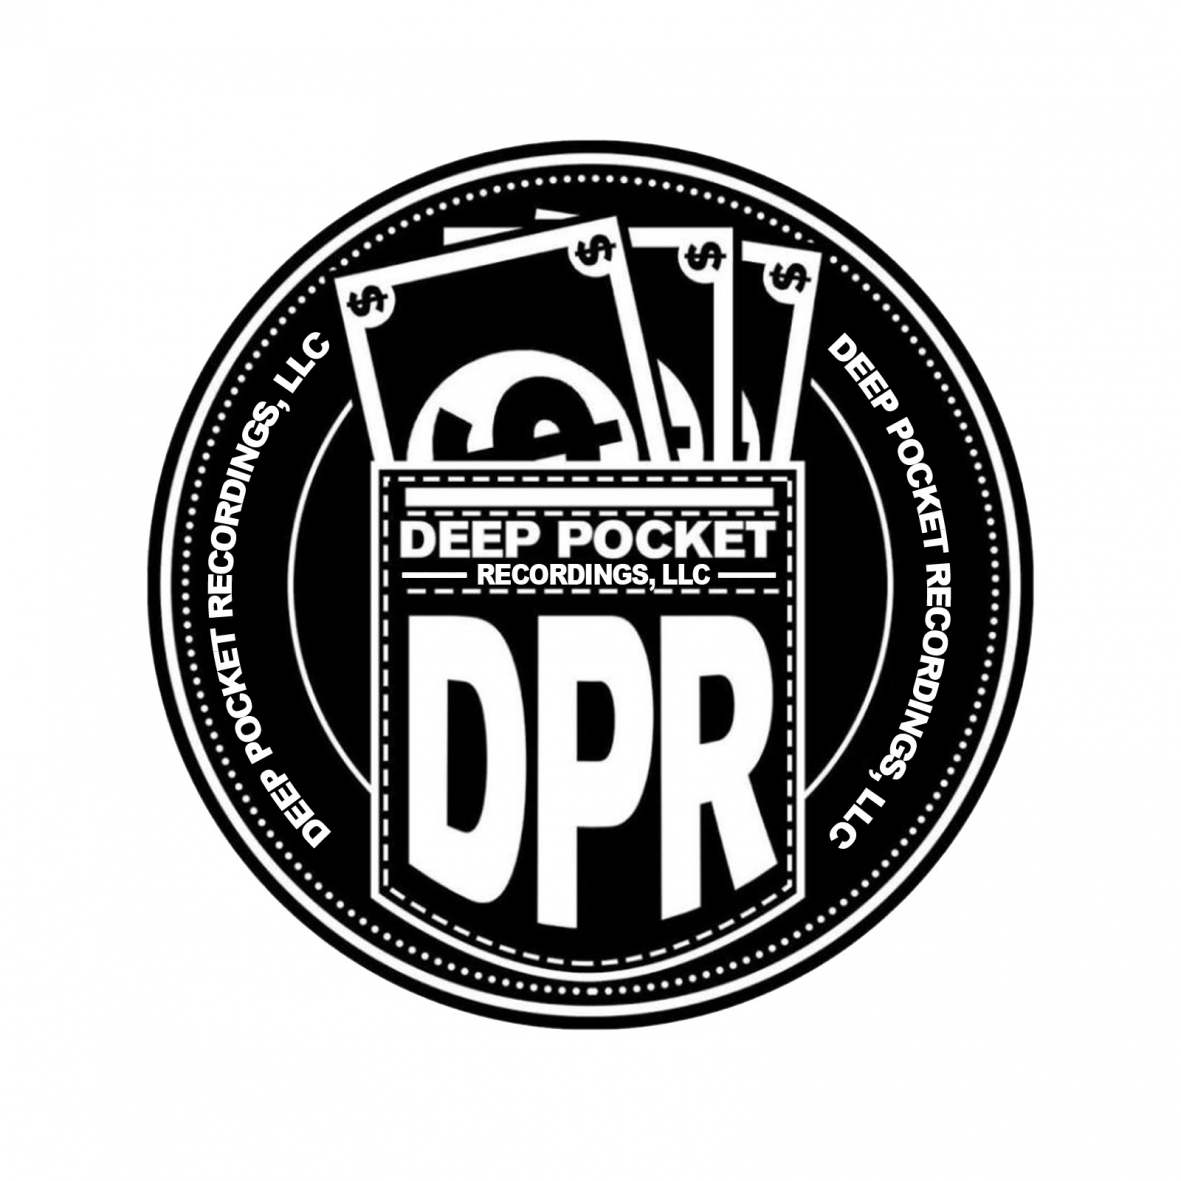 Deep Pocket Recordings, LLC